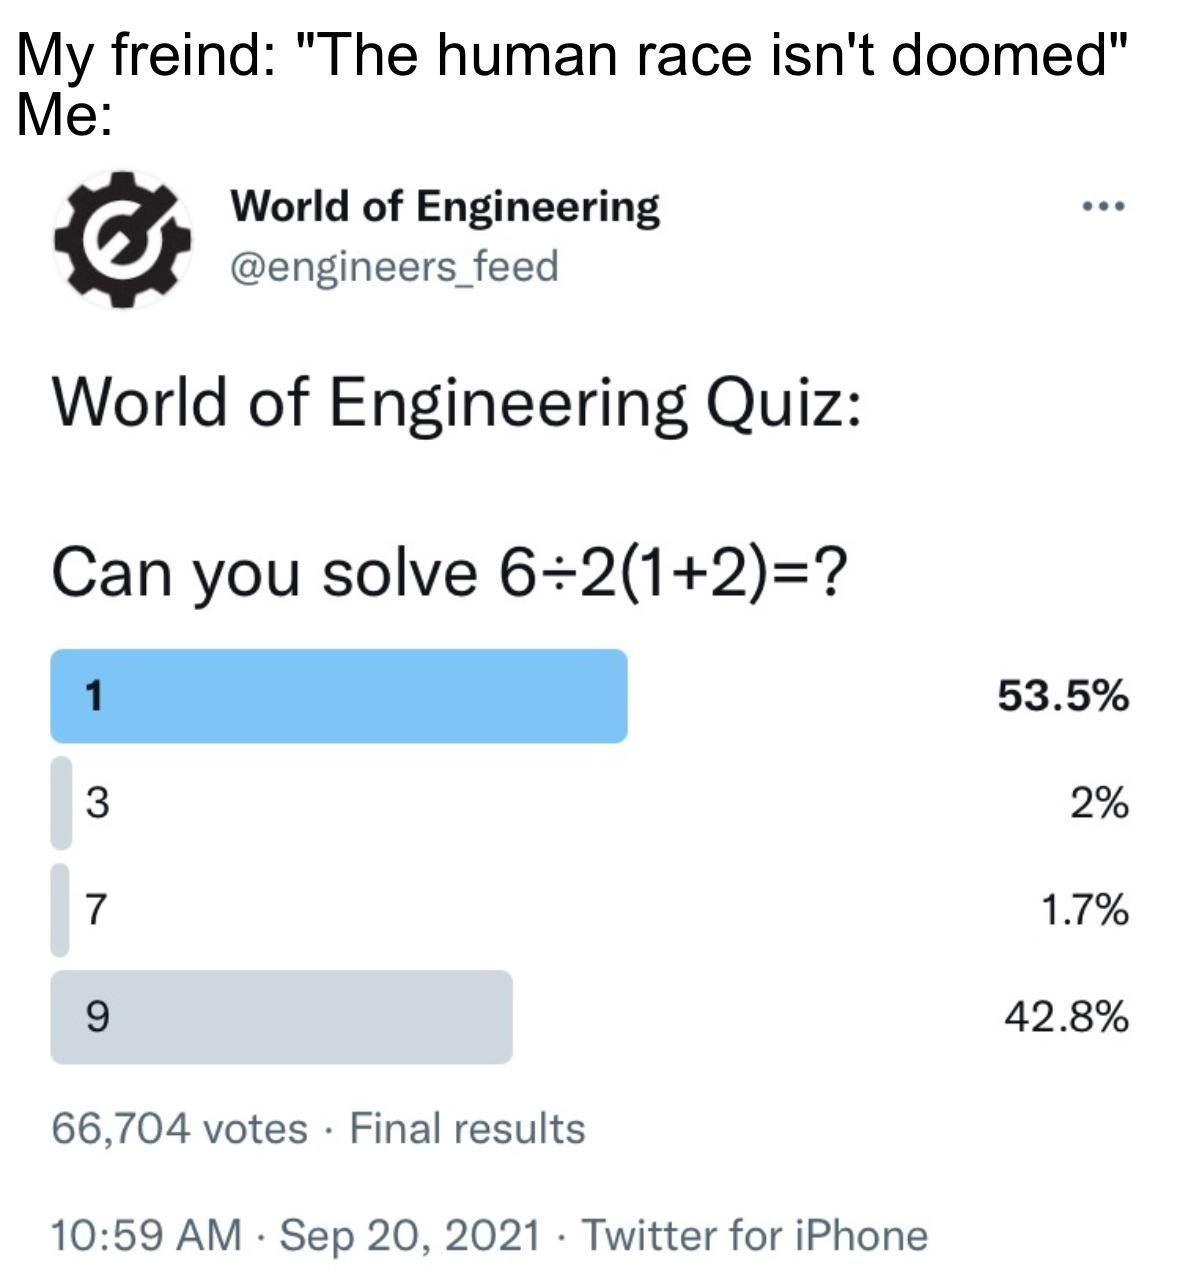 Obrázek Engineeringwillsavehumanity